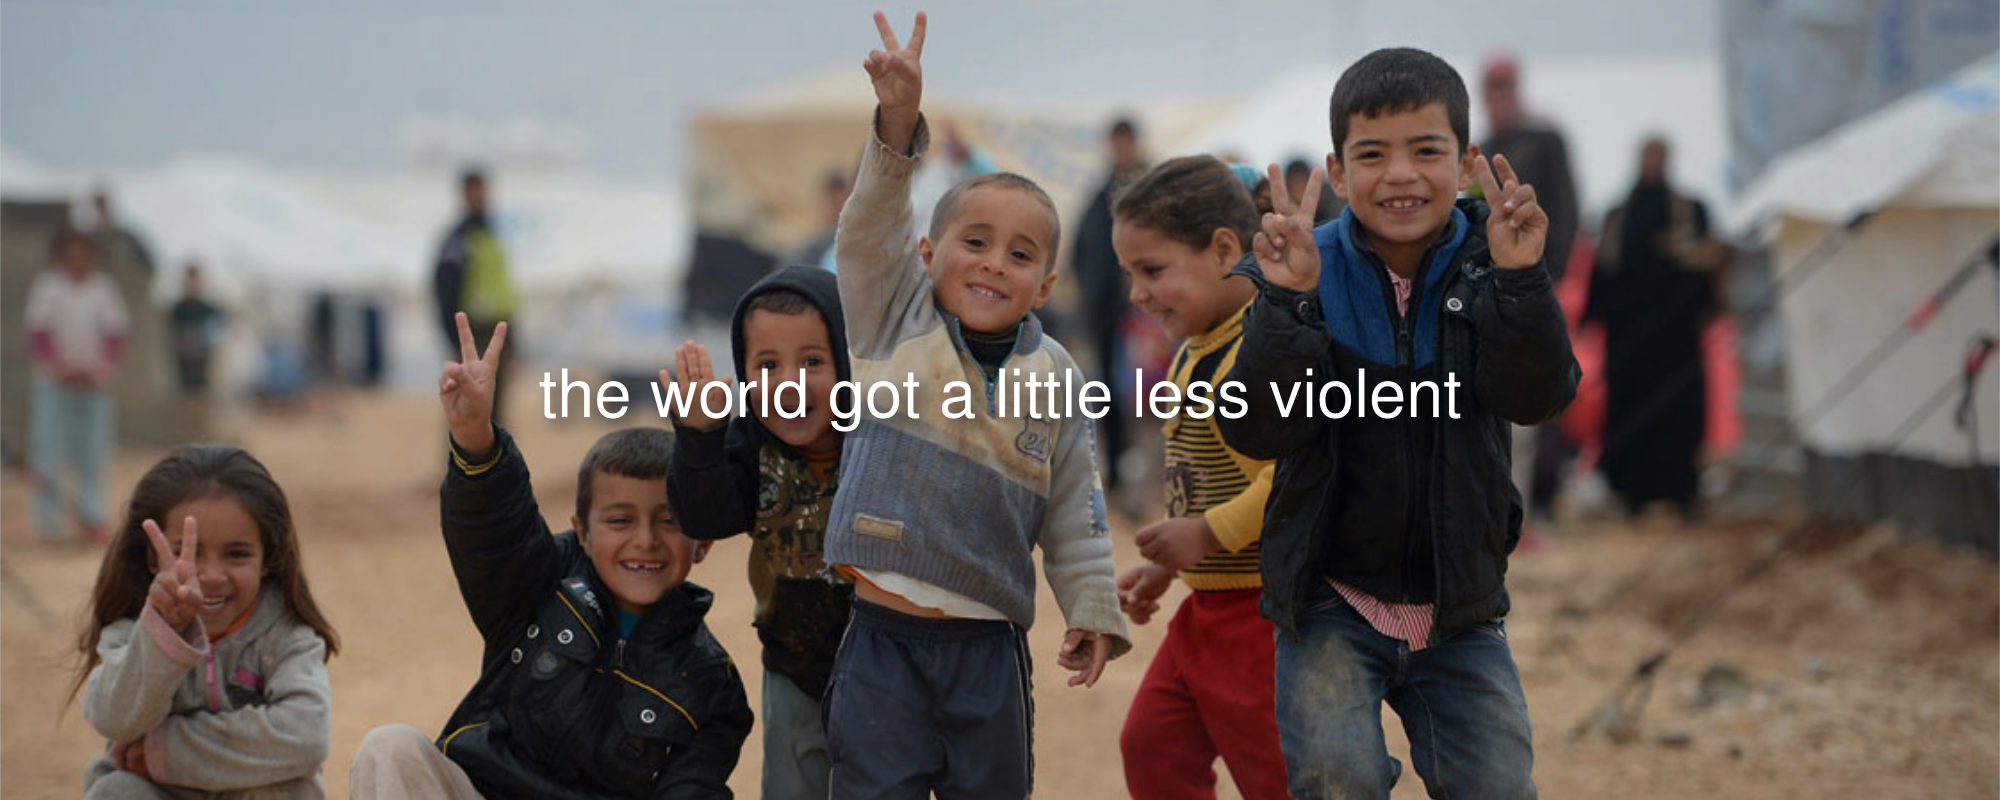 Syrian refugee children (Image credit: Freedom House/Flickr )